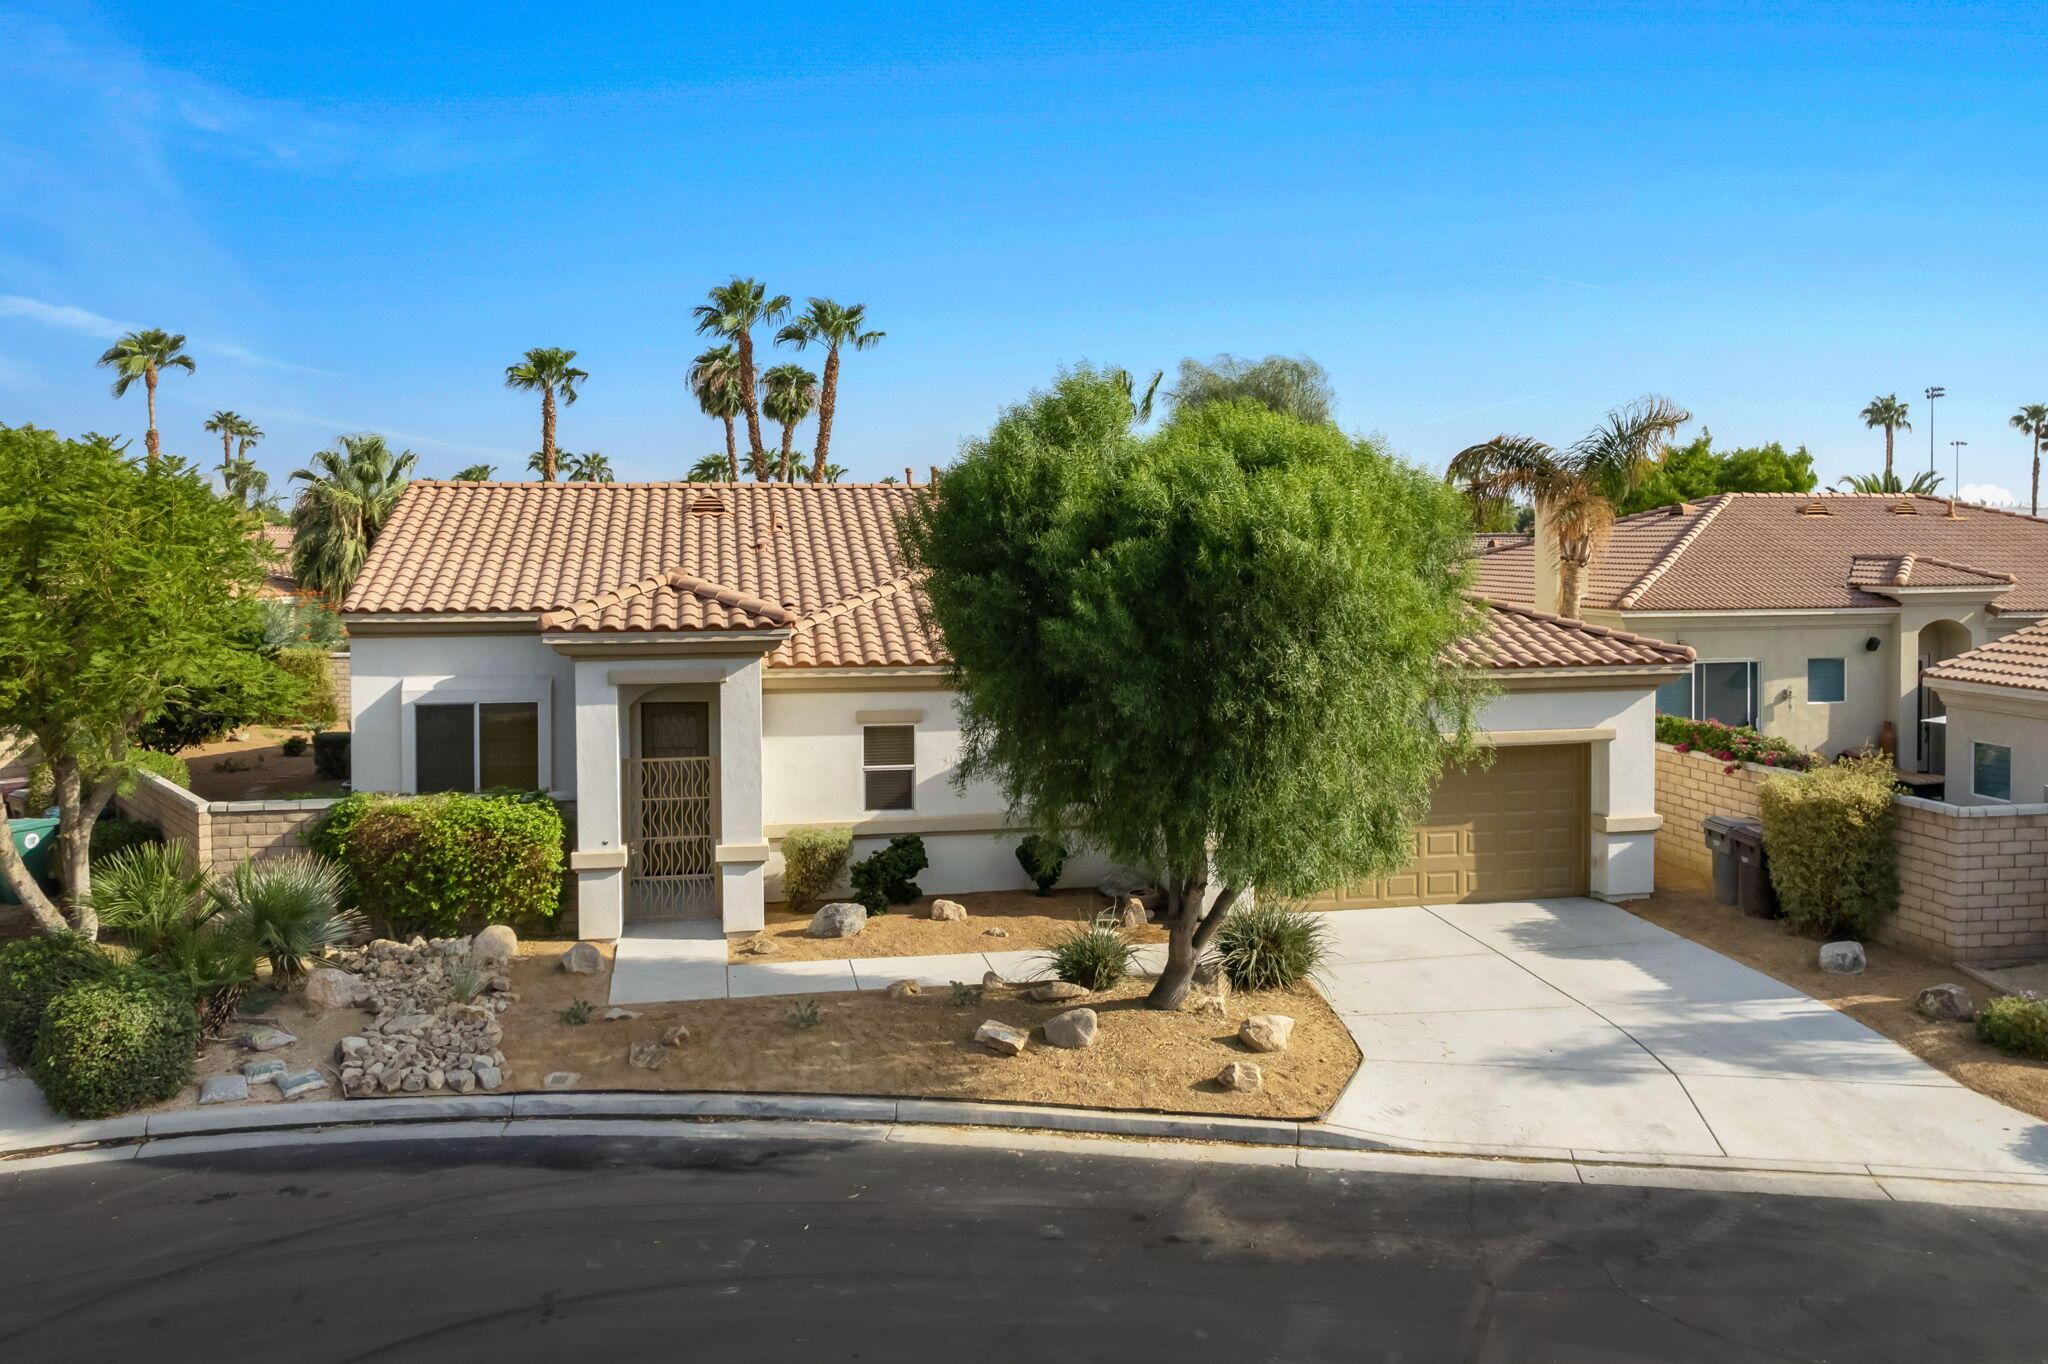 Photo of 92 Clavel Court, Palm Desert, CA 92260